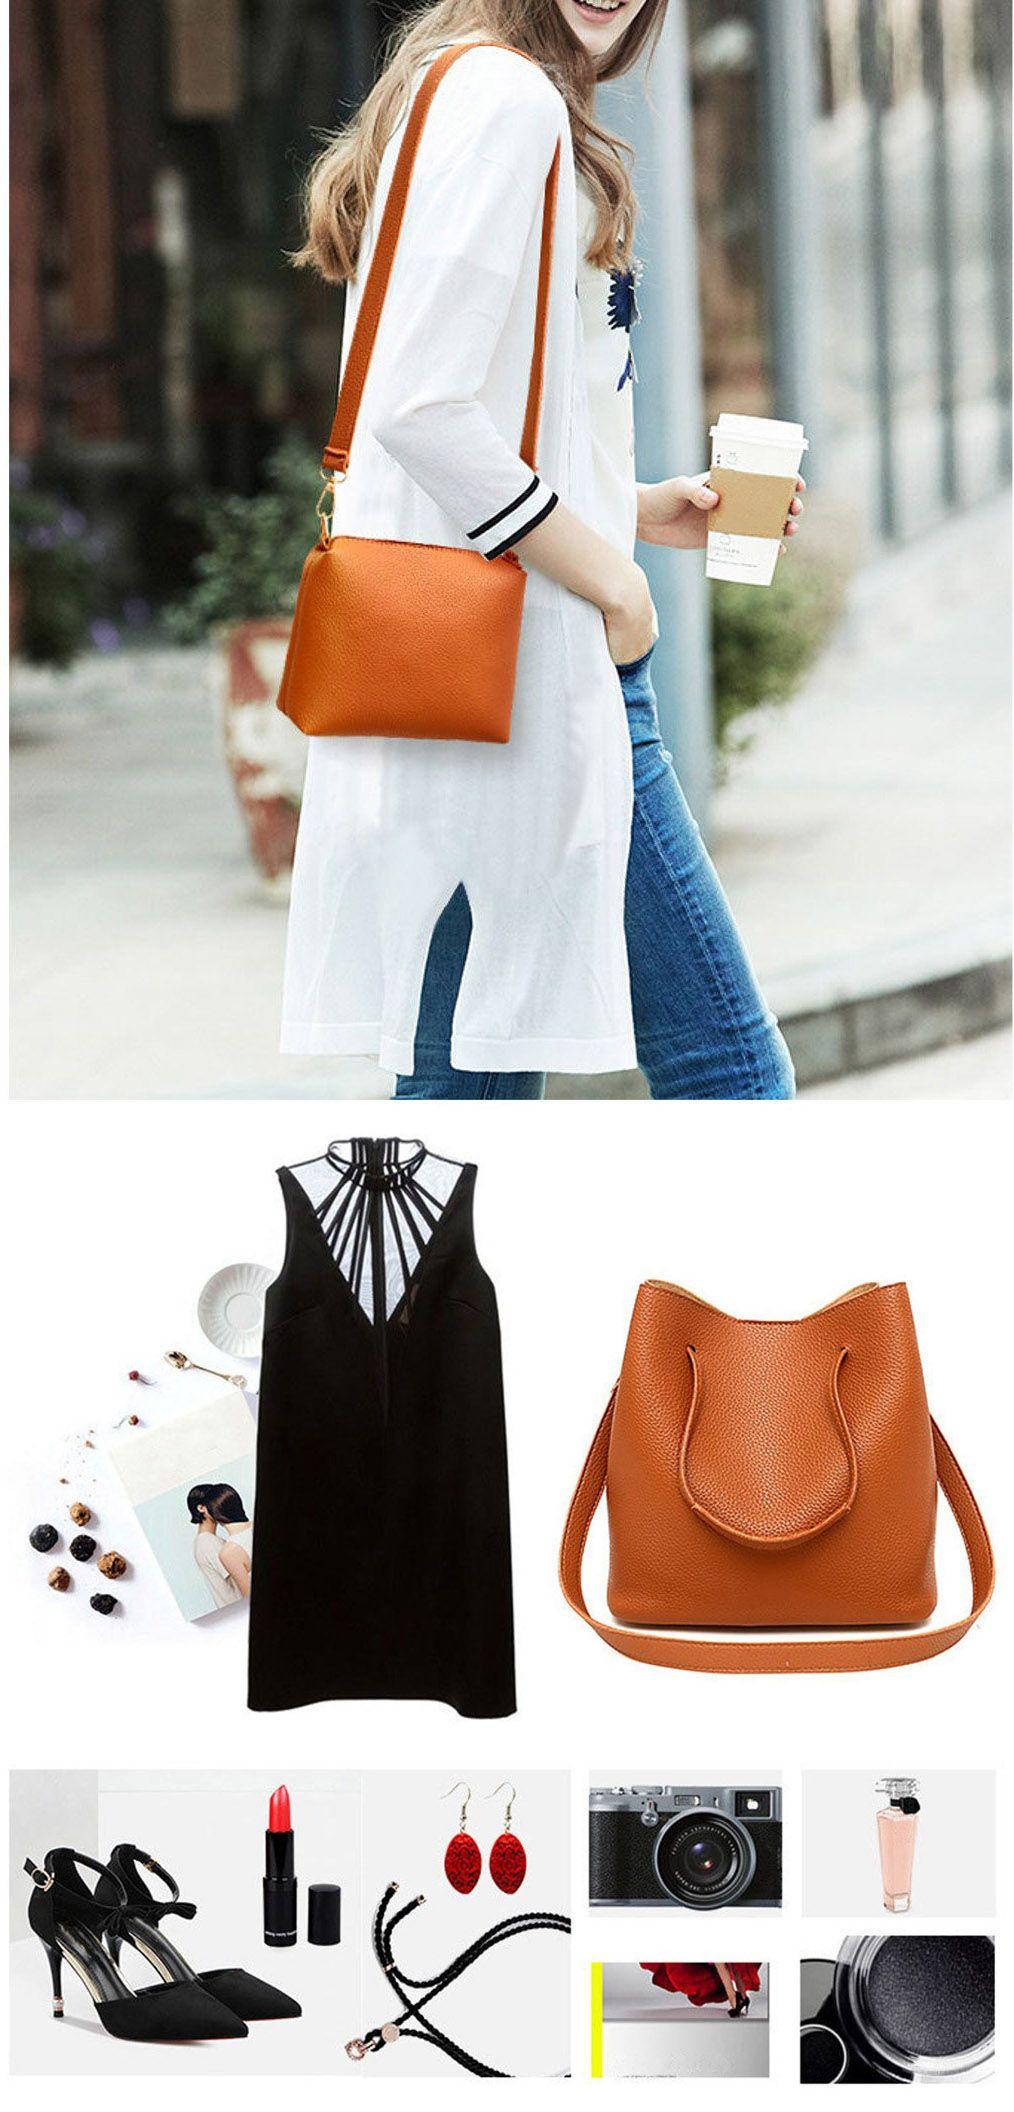 0852f9328f Bagail Women 4 PCS PU Leather Tote Bag Crossbody Bag